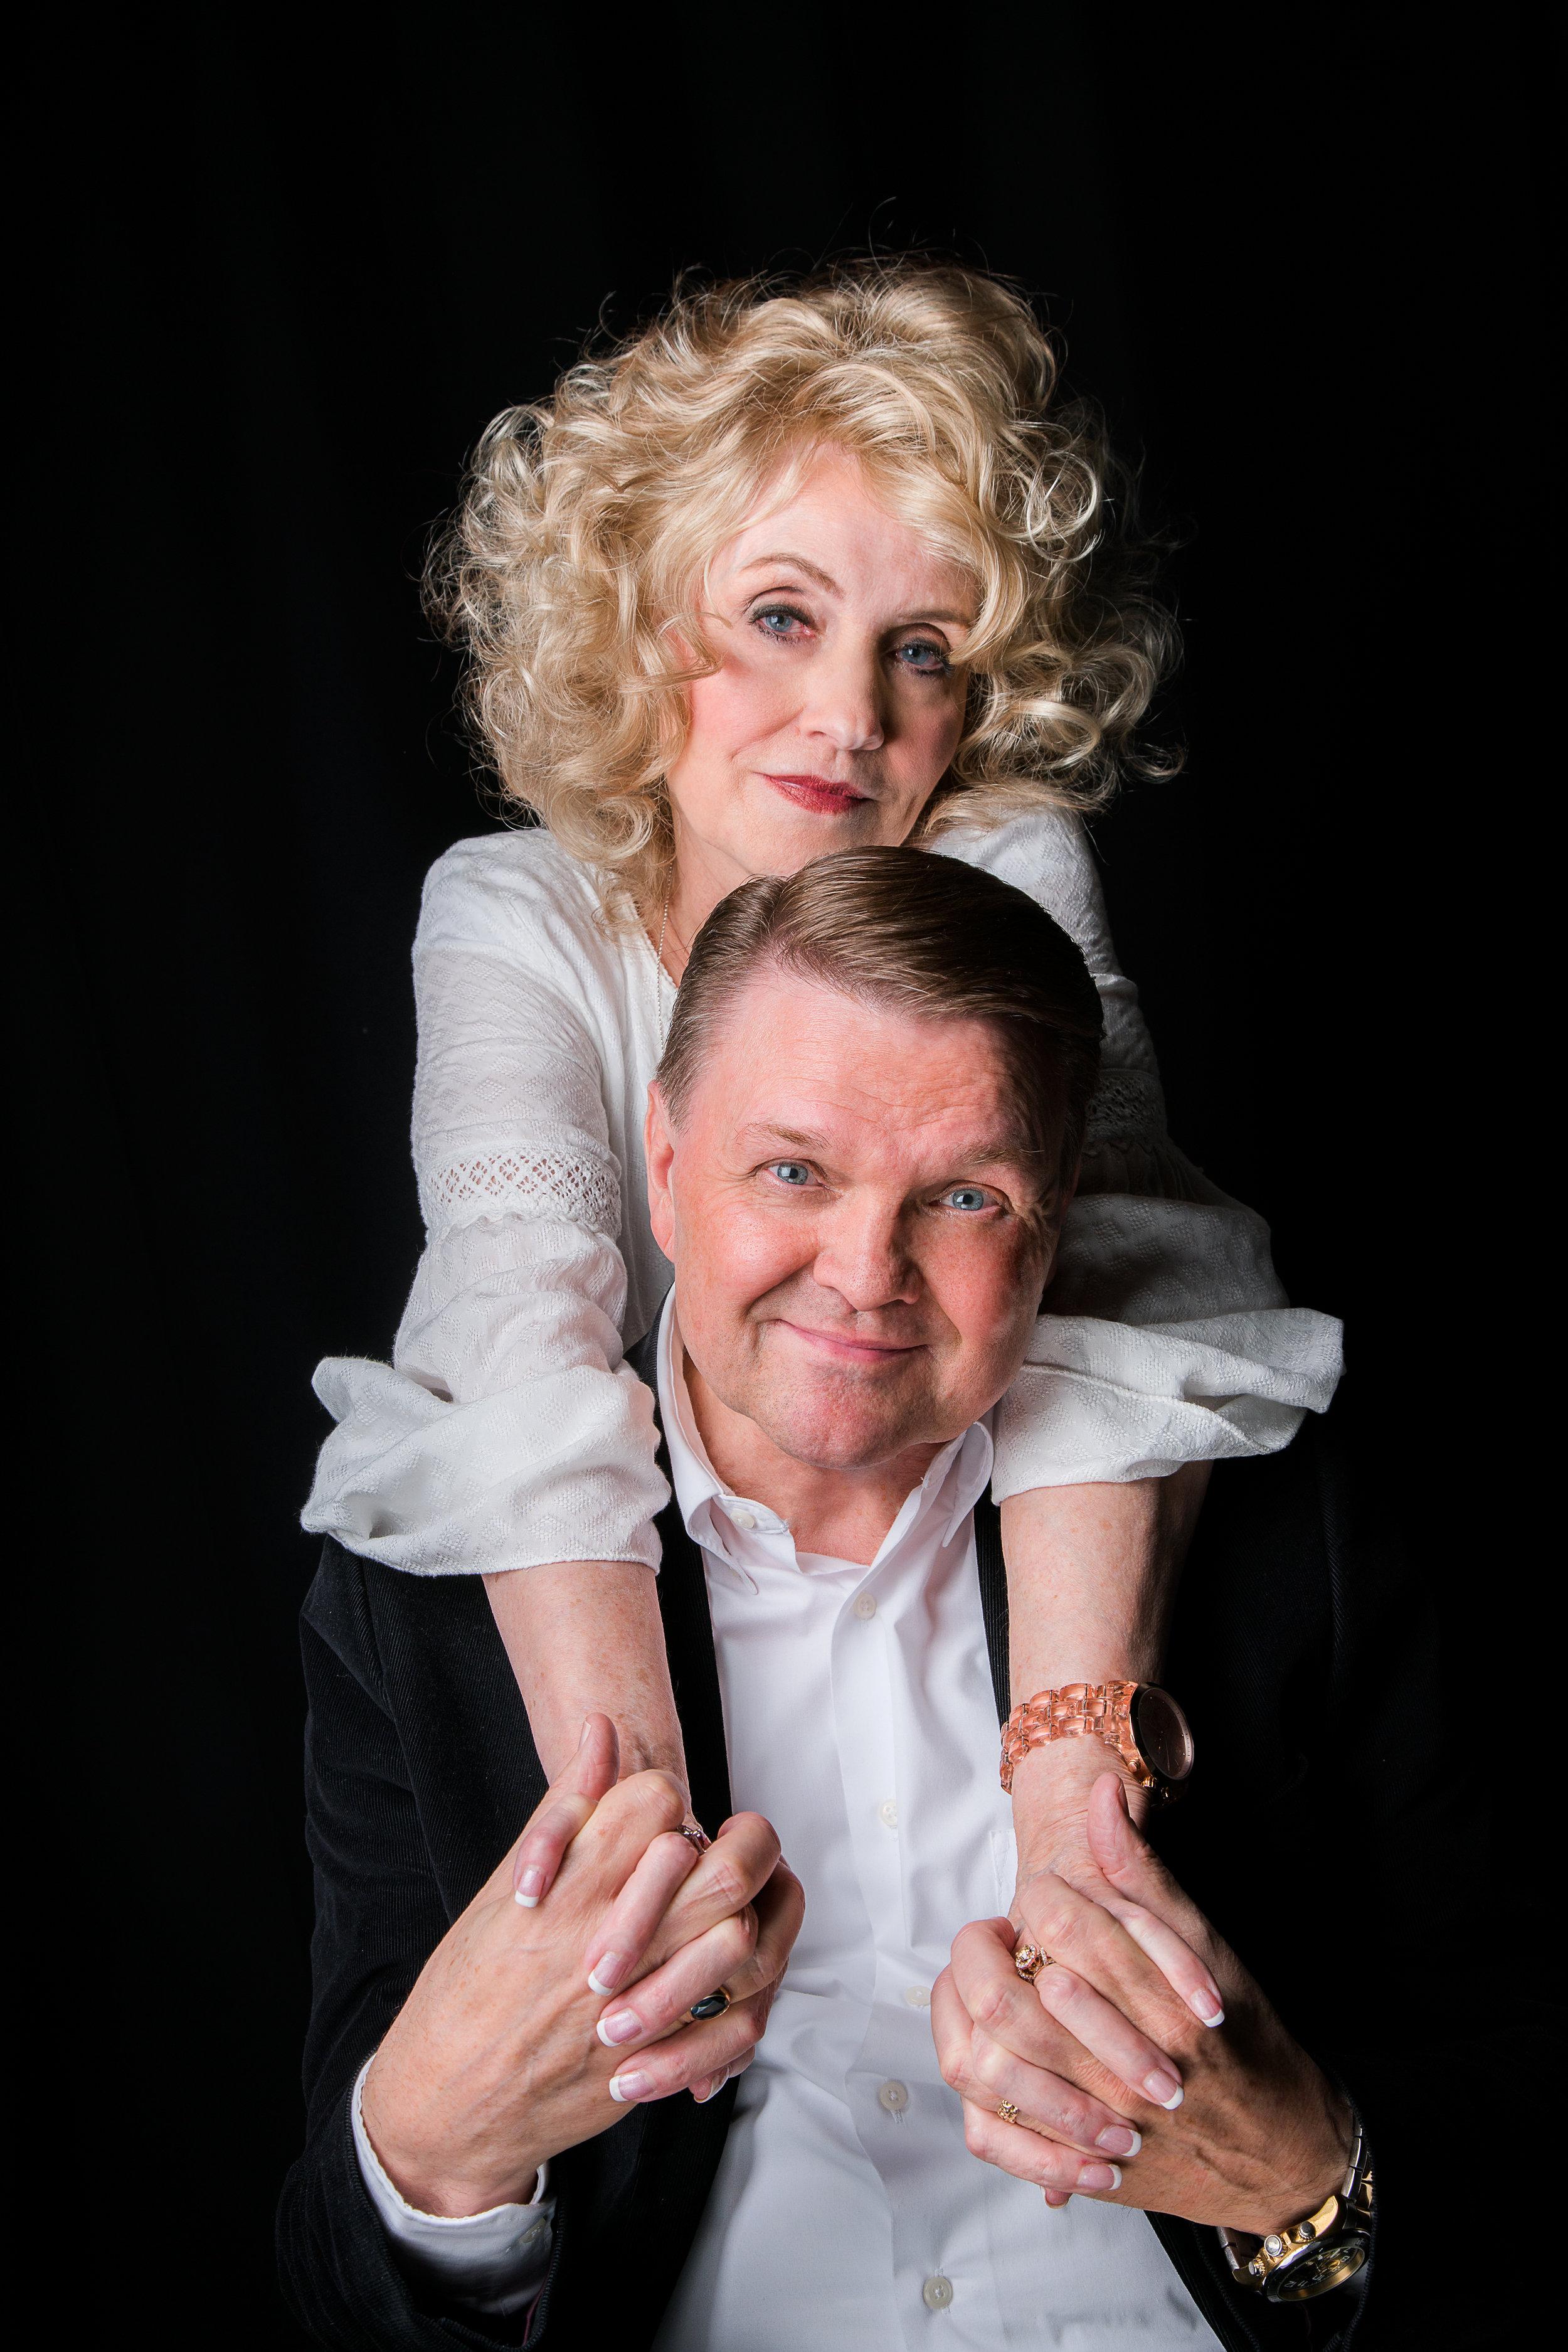 Dixie Andelin Forsyth, with her husband Robert D. Forsyth